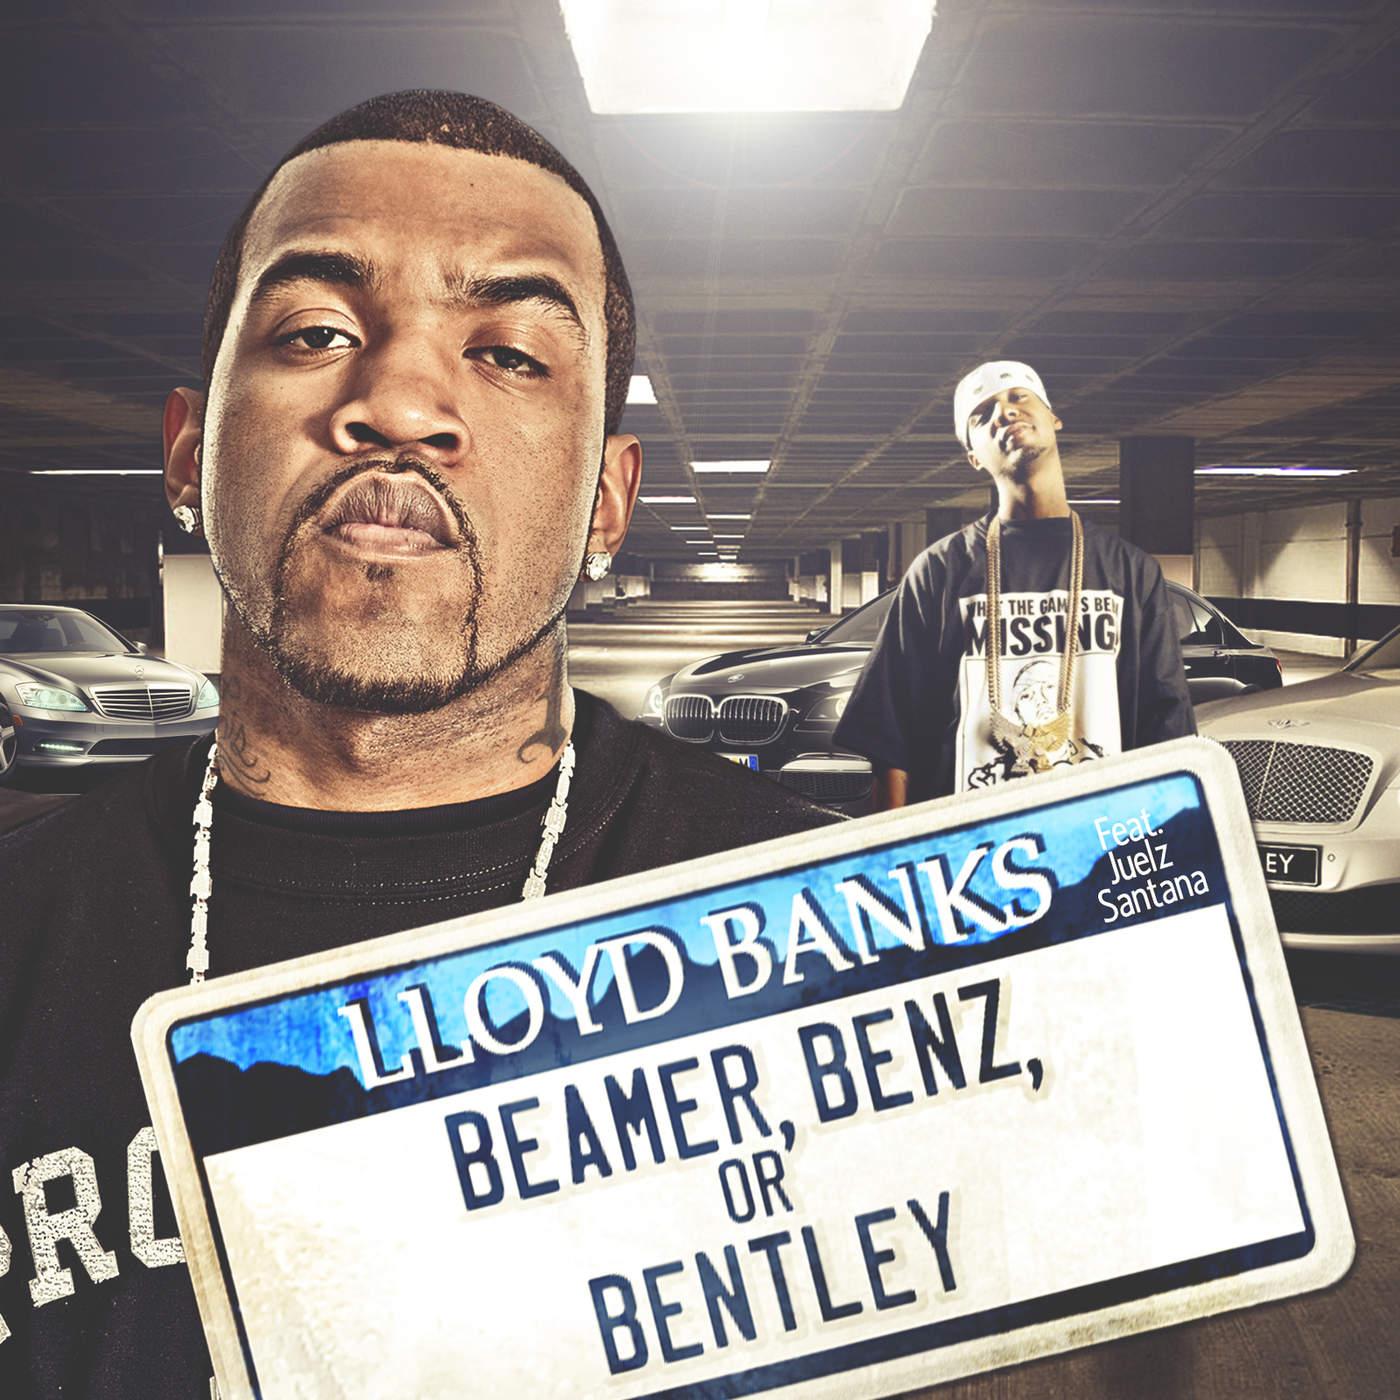 Lloyd Banks - Beamer, Benz, or Bentley (feat. Juelz Santana) - Single Cover